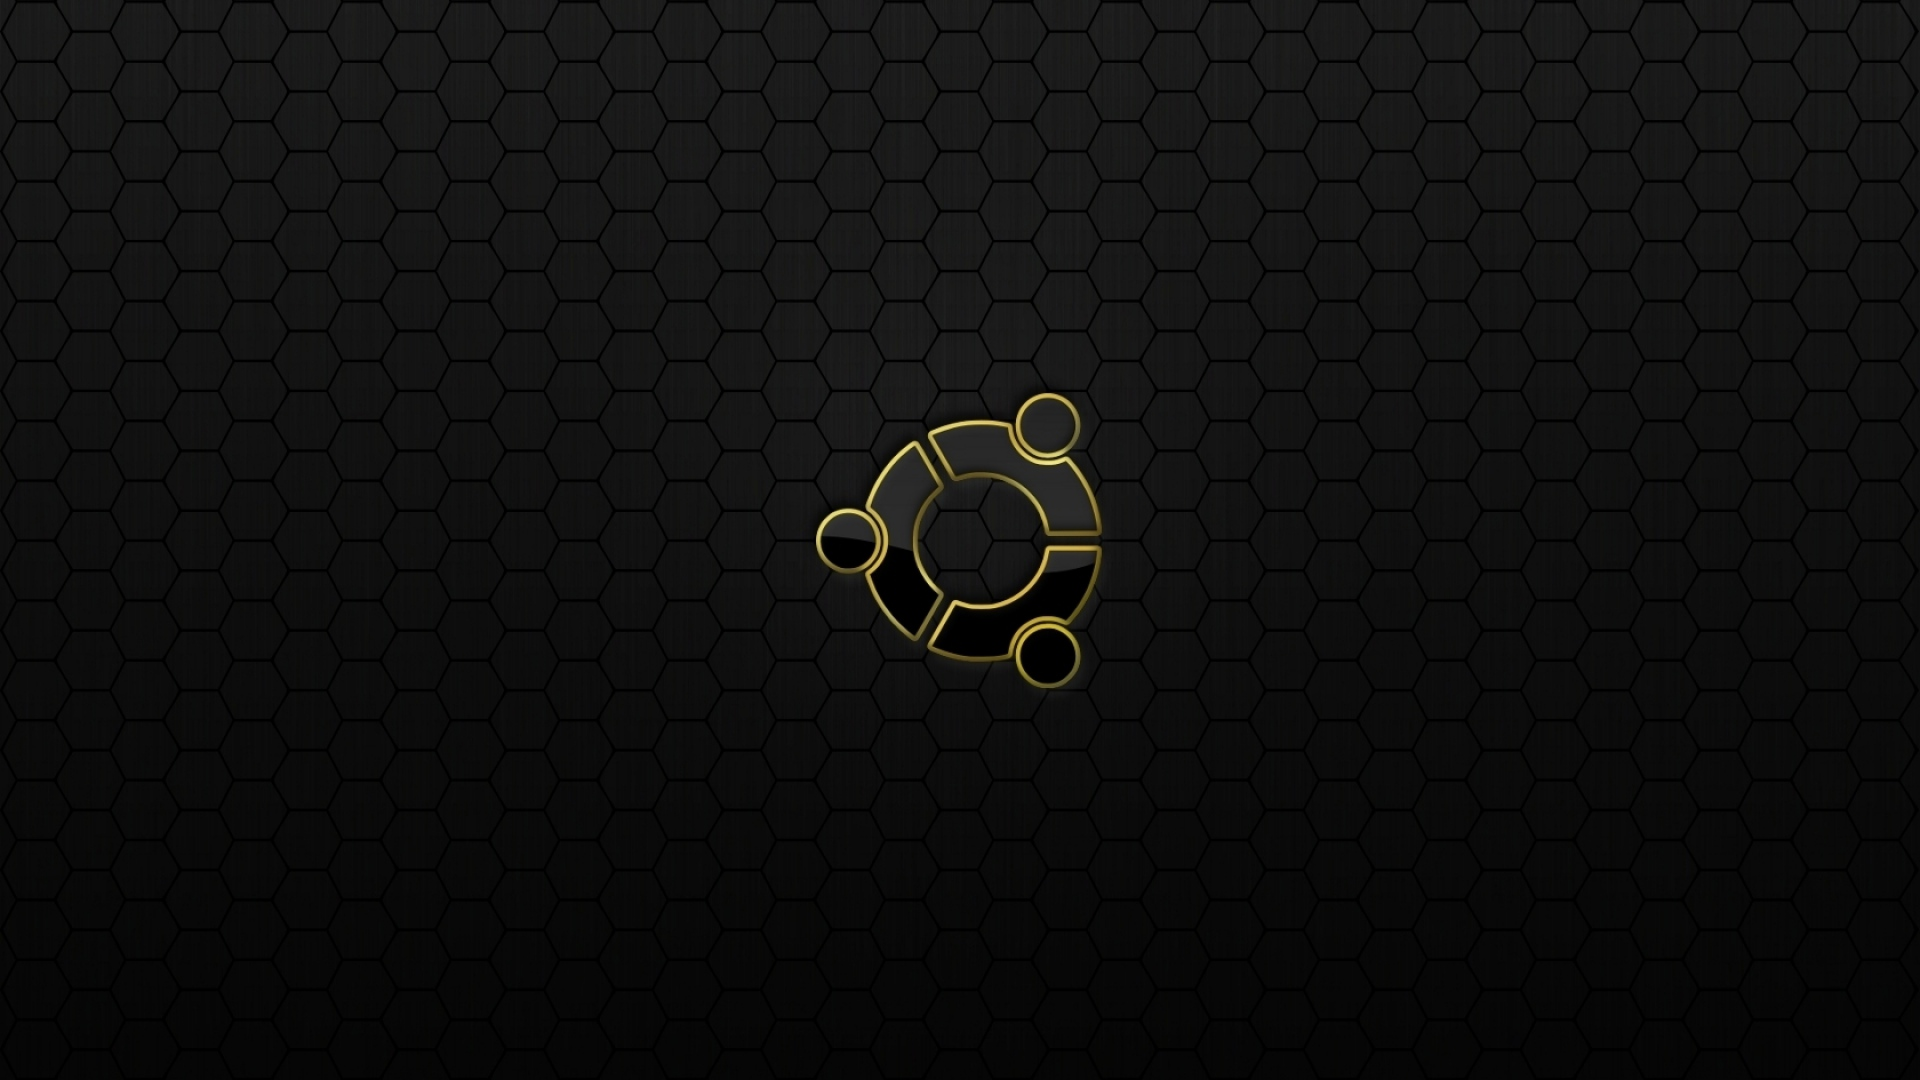 Download Wallpaper 1920x1080 Ubuntu Os Logo Black Yellow Full Hd